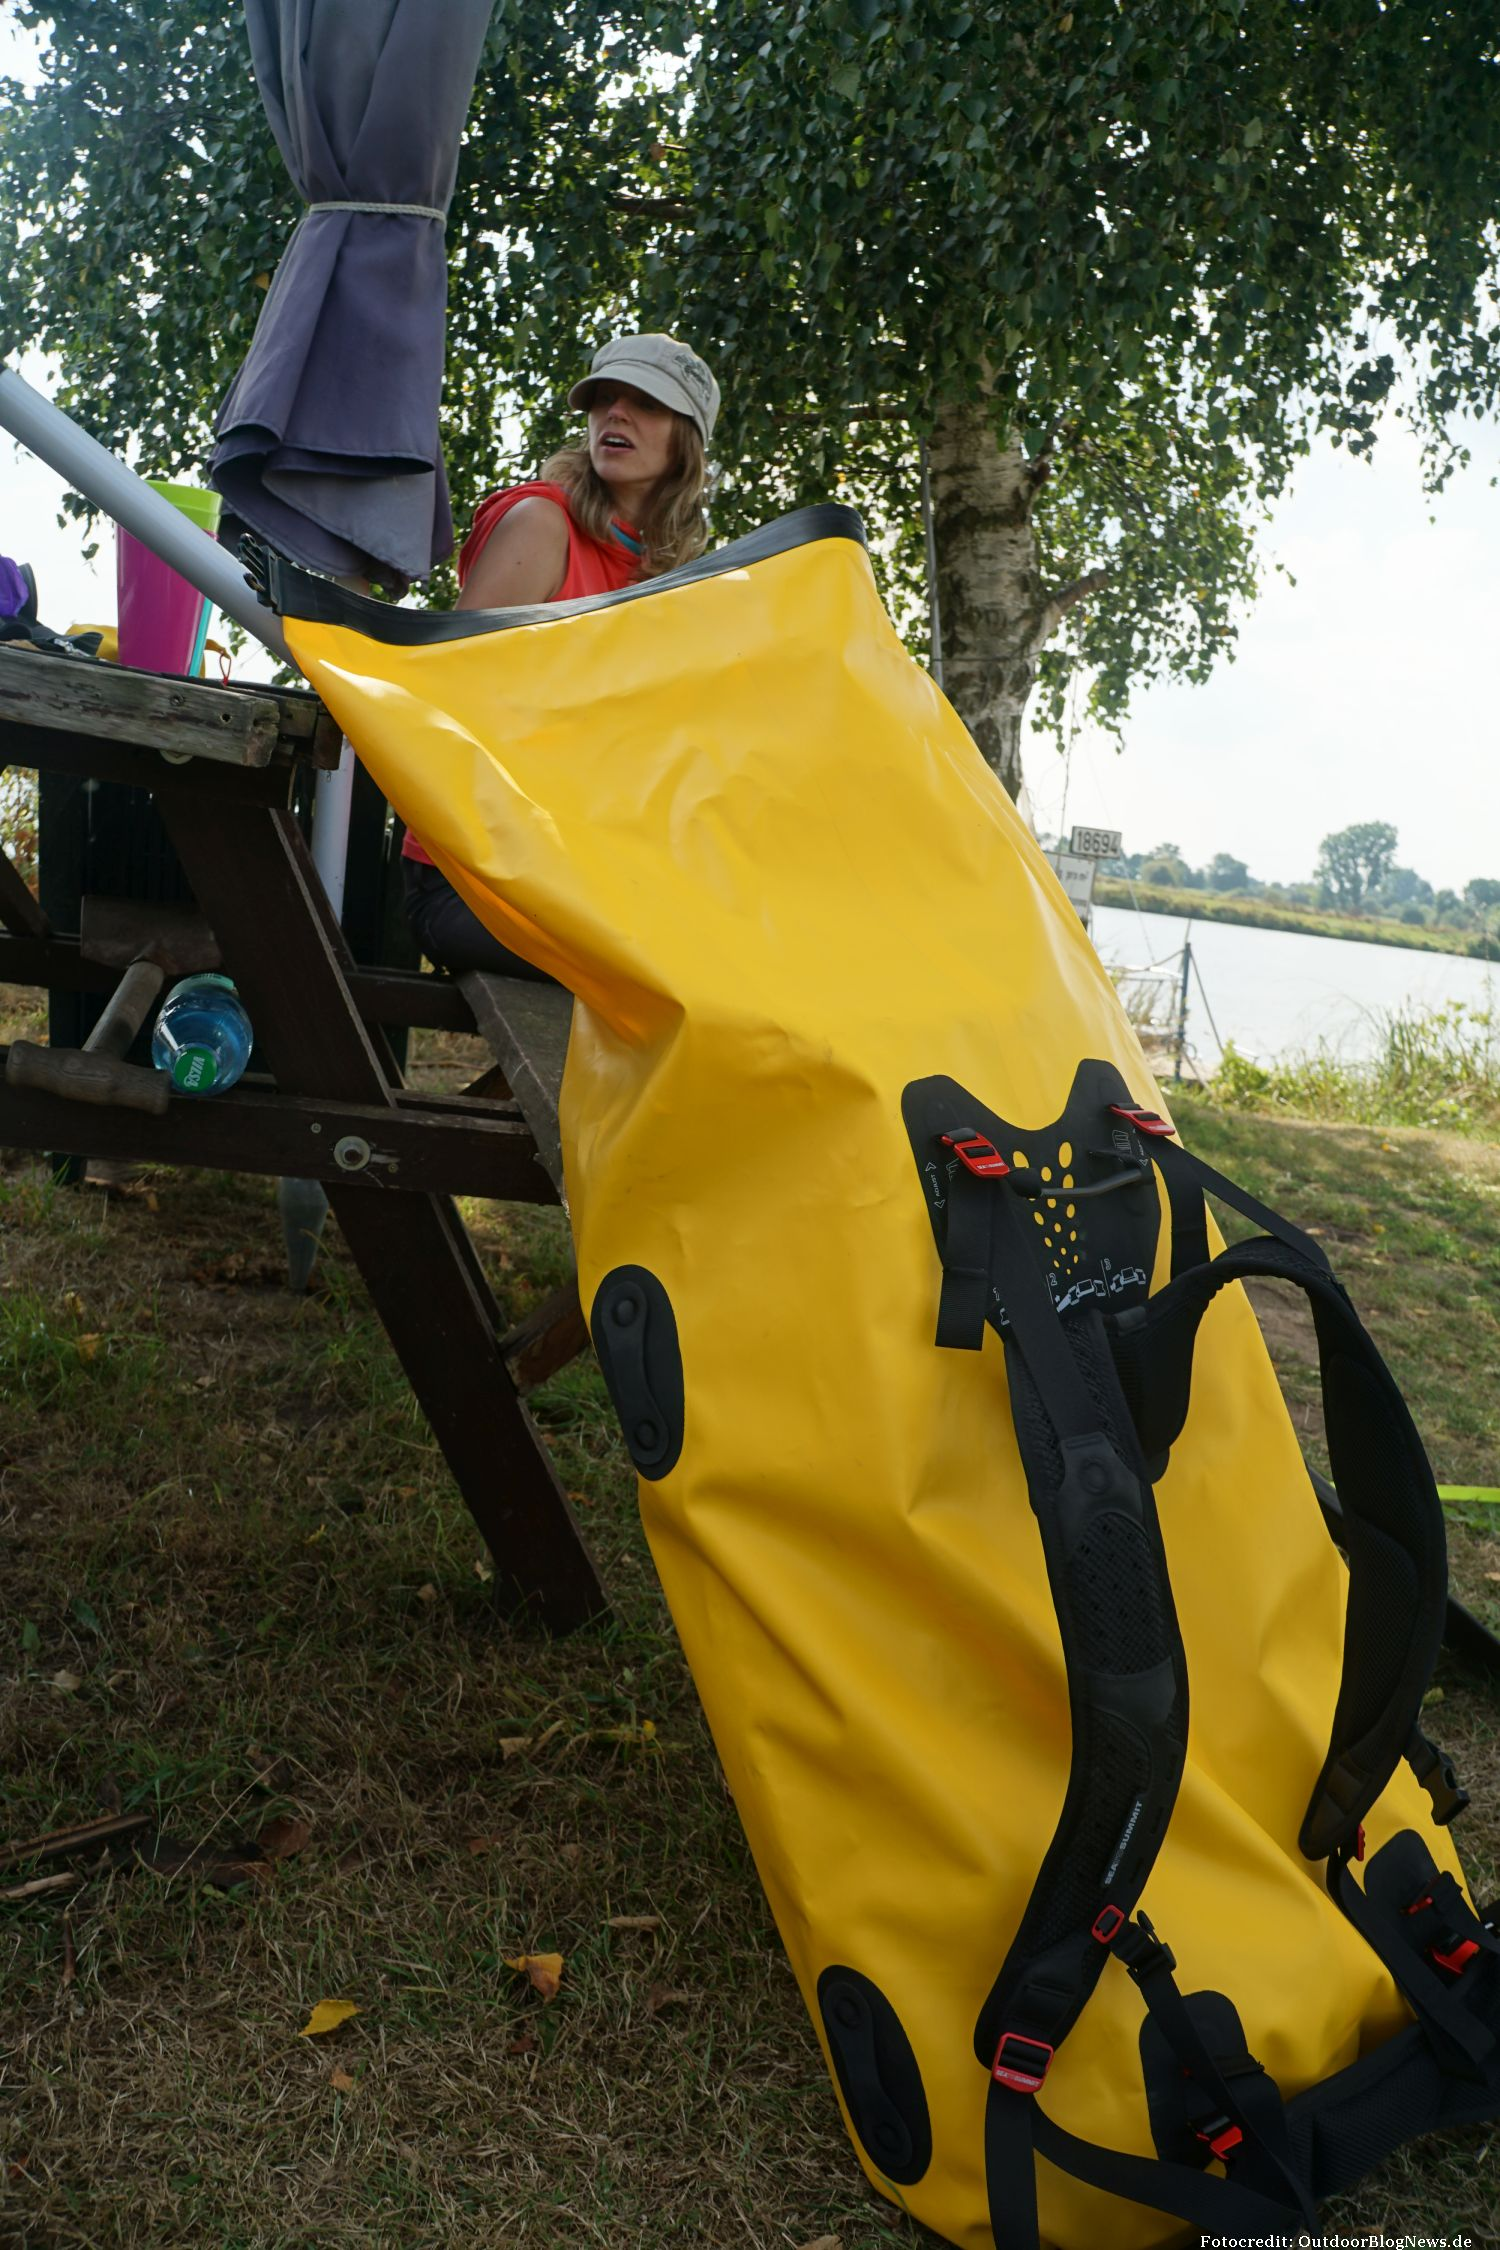 sea to summit hydraulic dry pack 120 liter der packsack. Black Bedroom Furniture Sets. Home Design Ideas